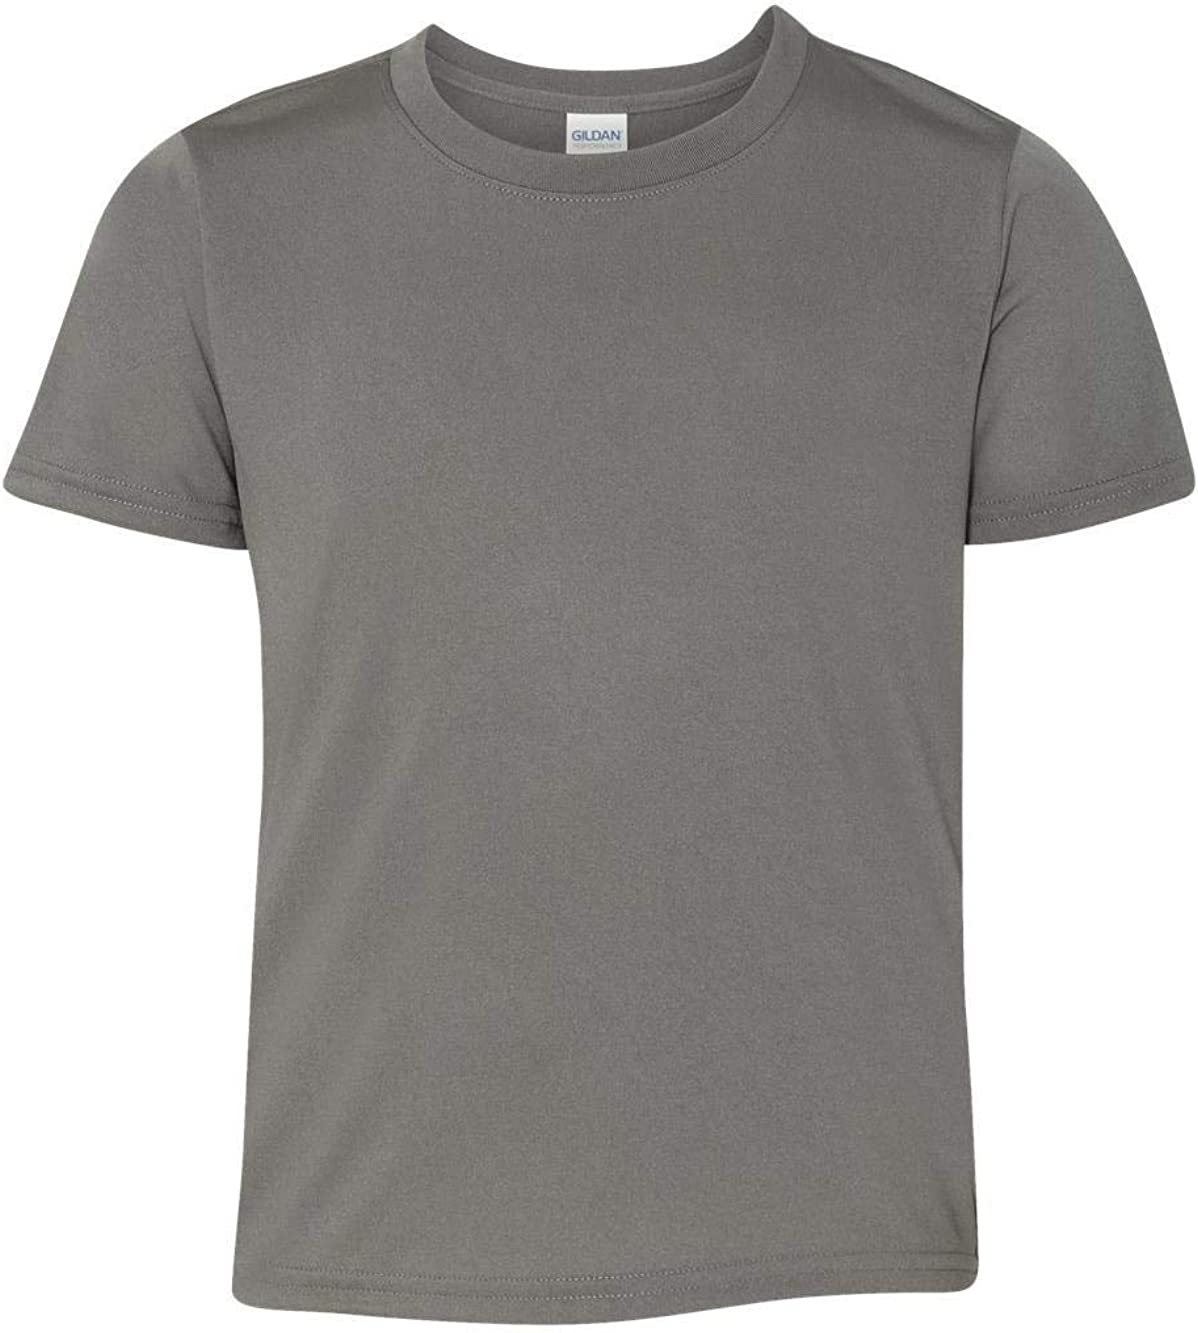 Gildan - Performance Youth Core T-Shirt - 46000B - XS - Charcoal